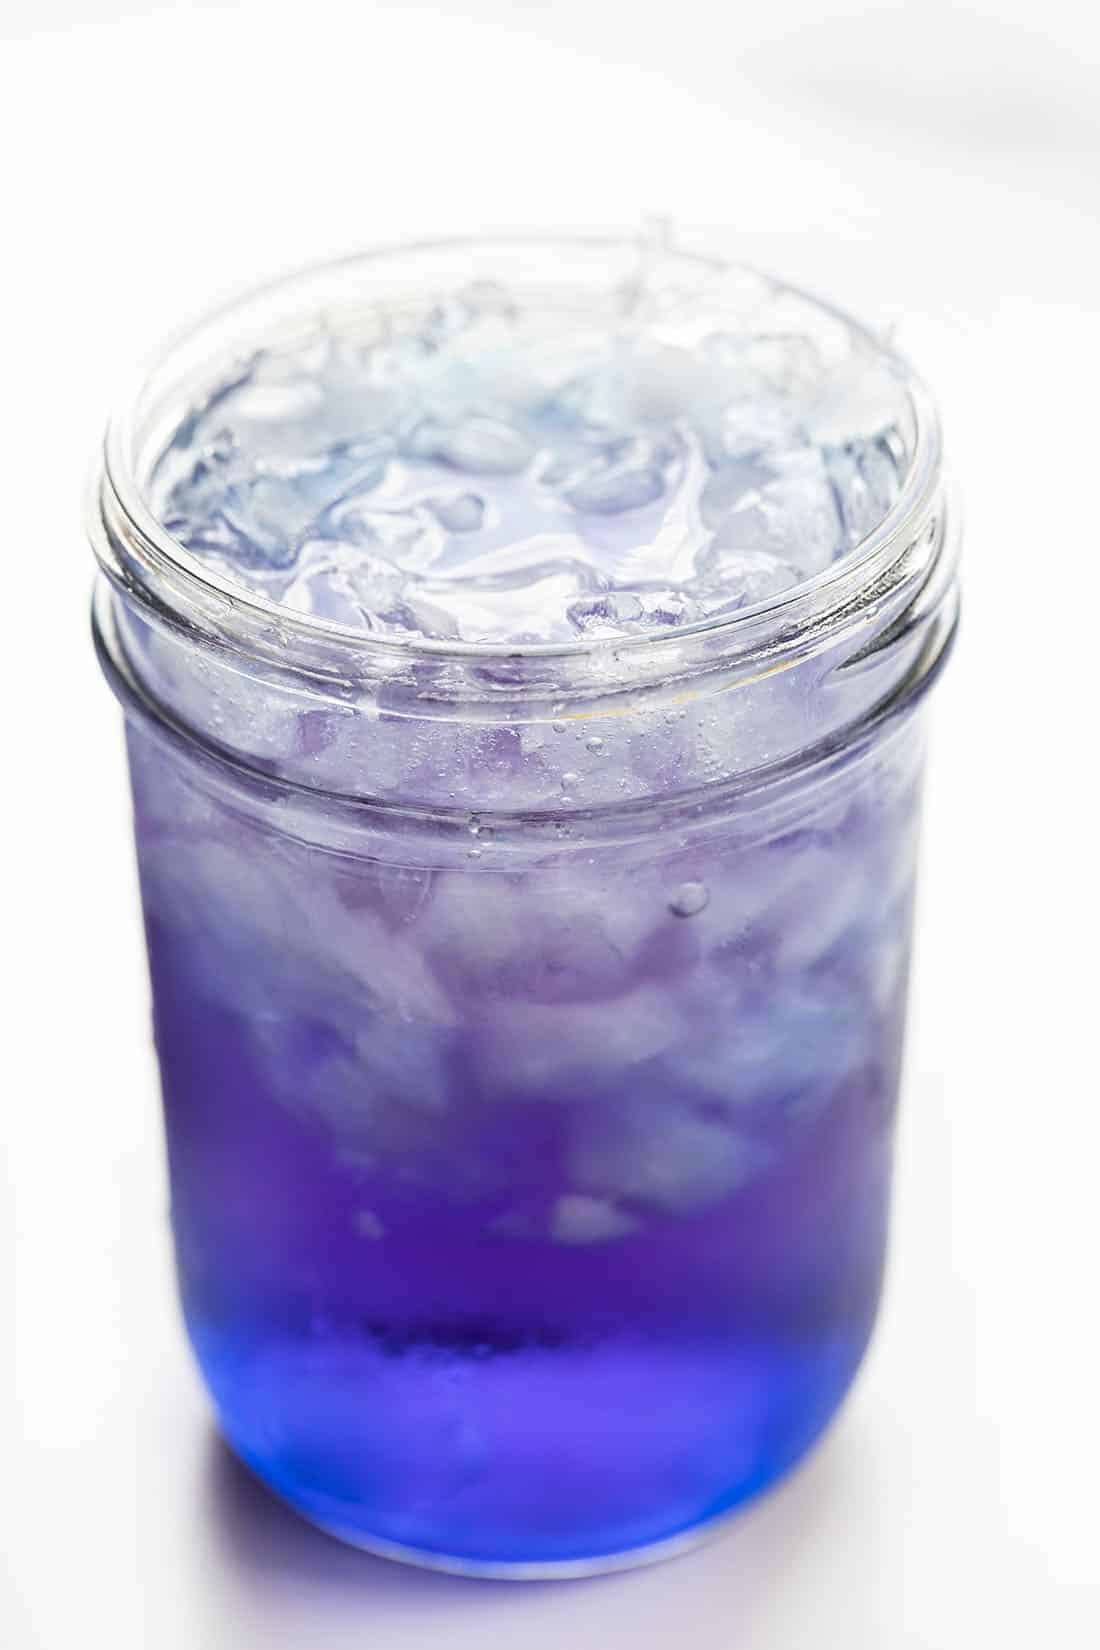 Mason Jar of The Grimace Cocktail